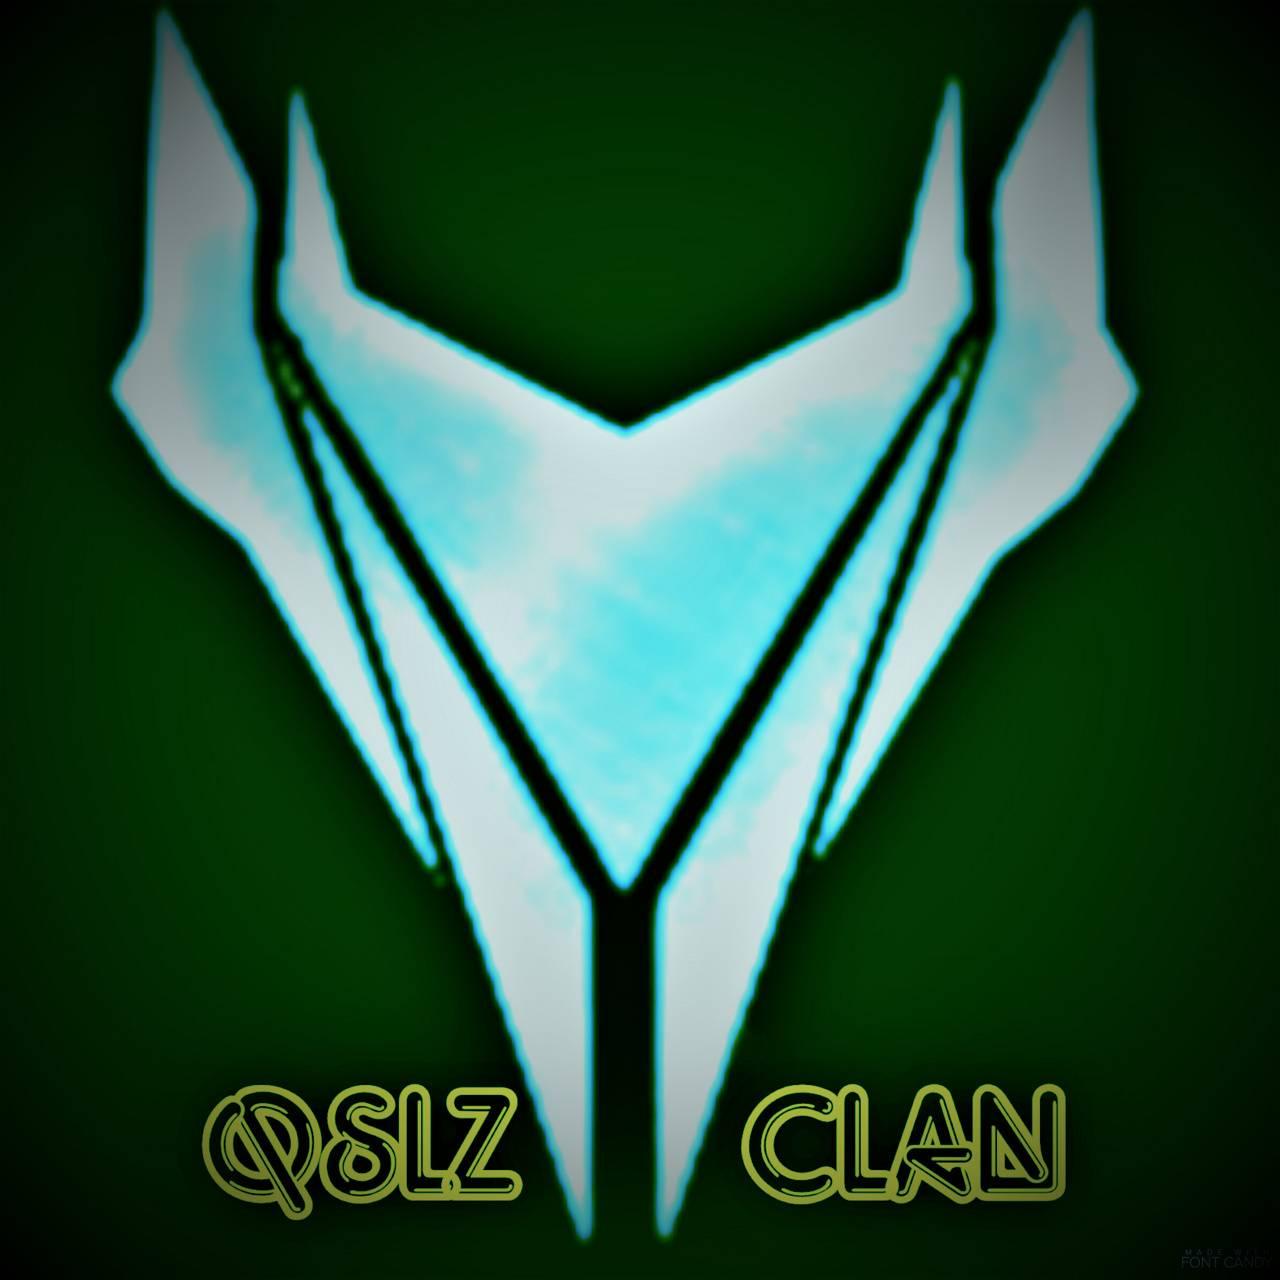 Qslz Clan